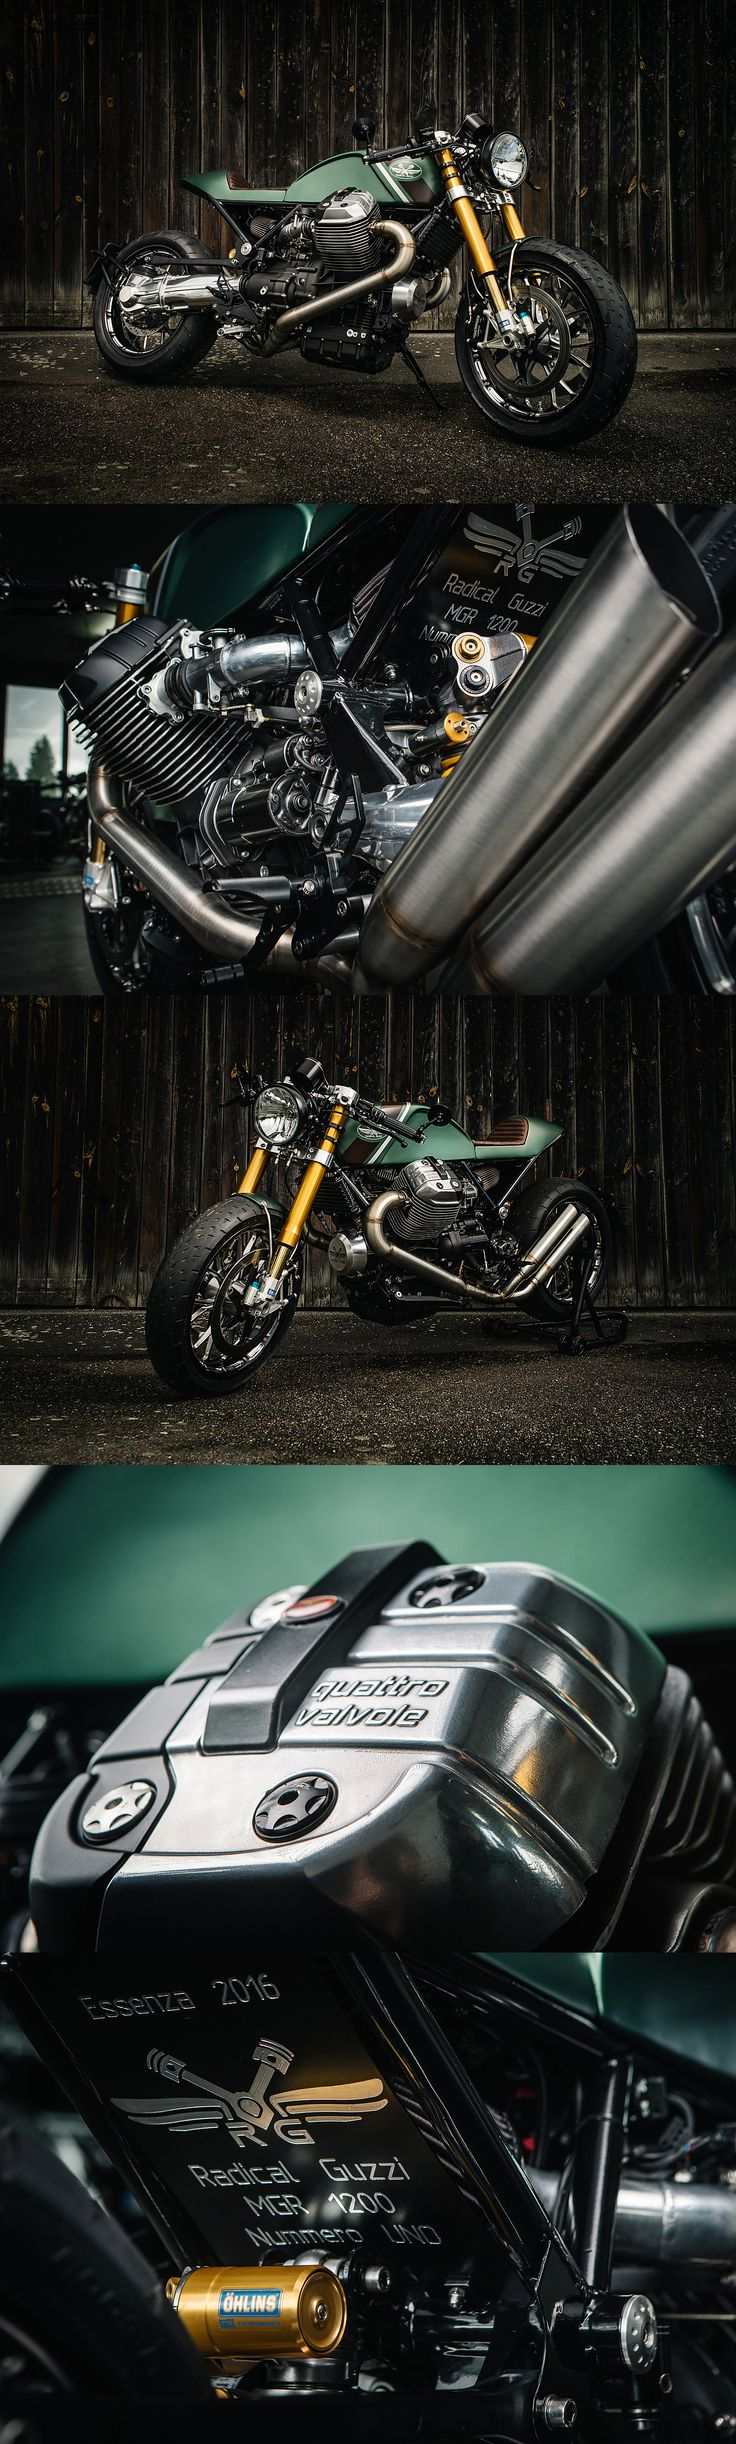 Moto Guzzi MGR 1200:  bikebrewers.com/moto-guzzi-mgr-1200-by-radical-guzzi/